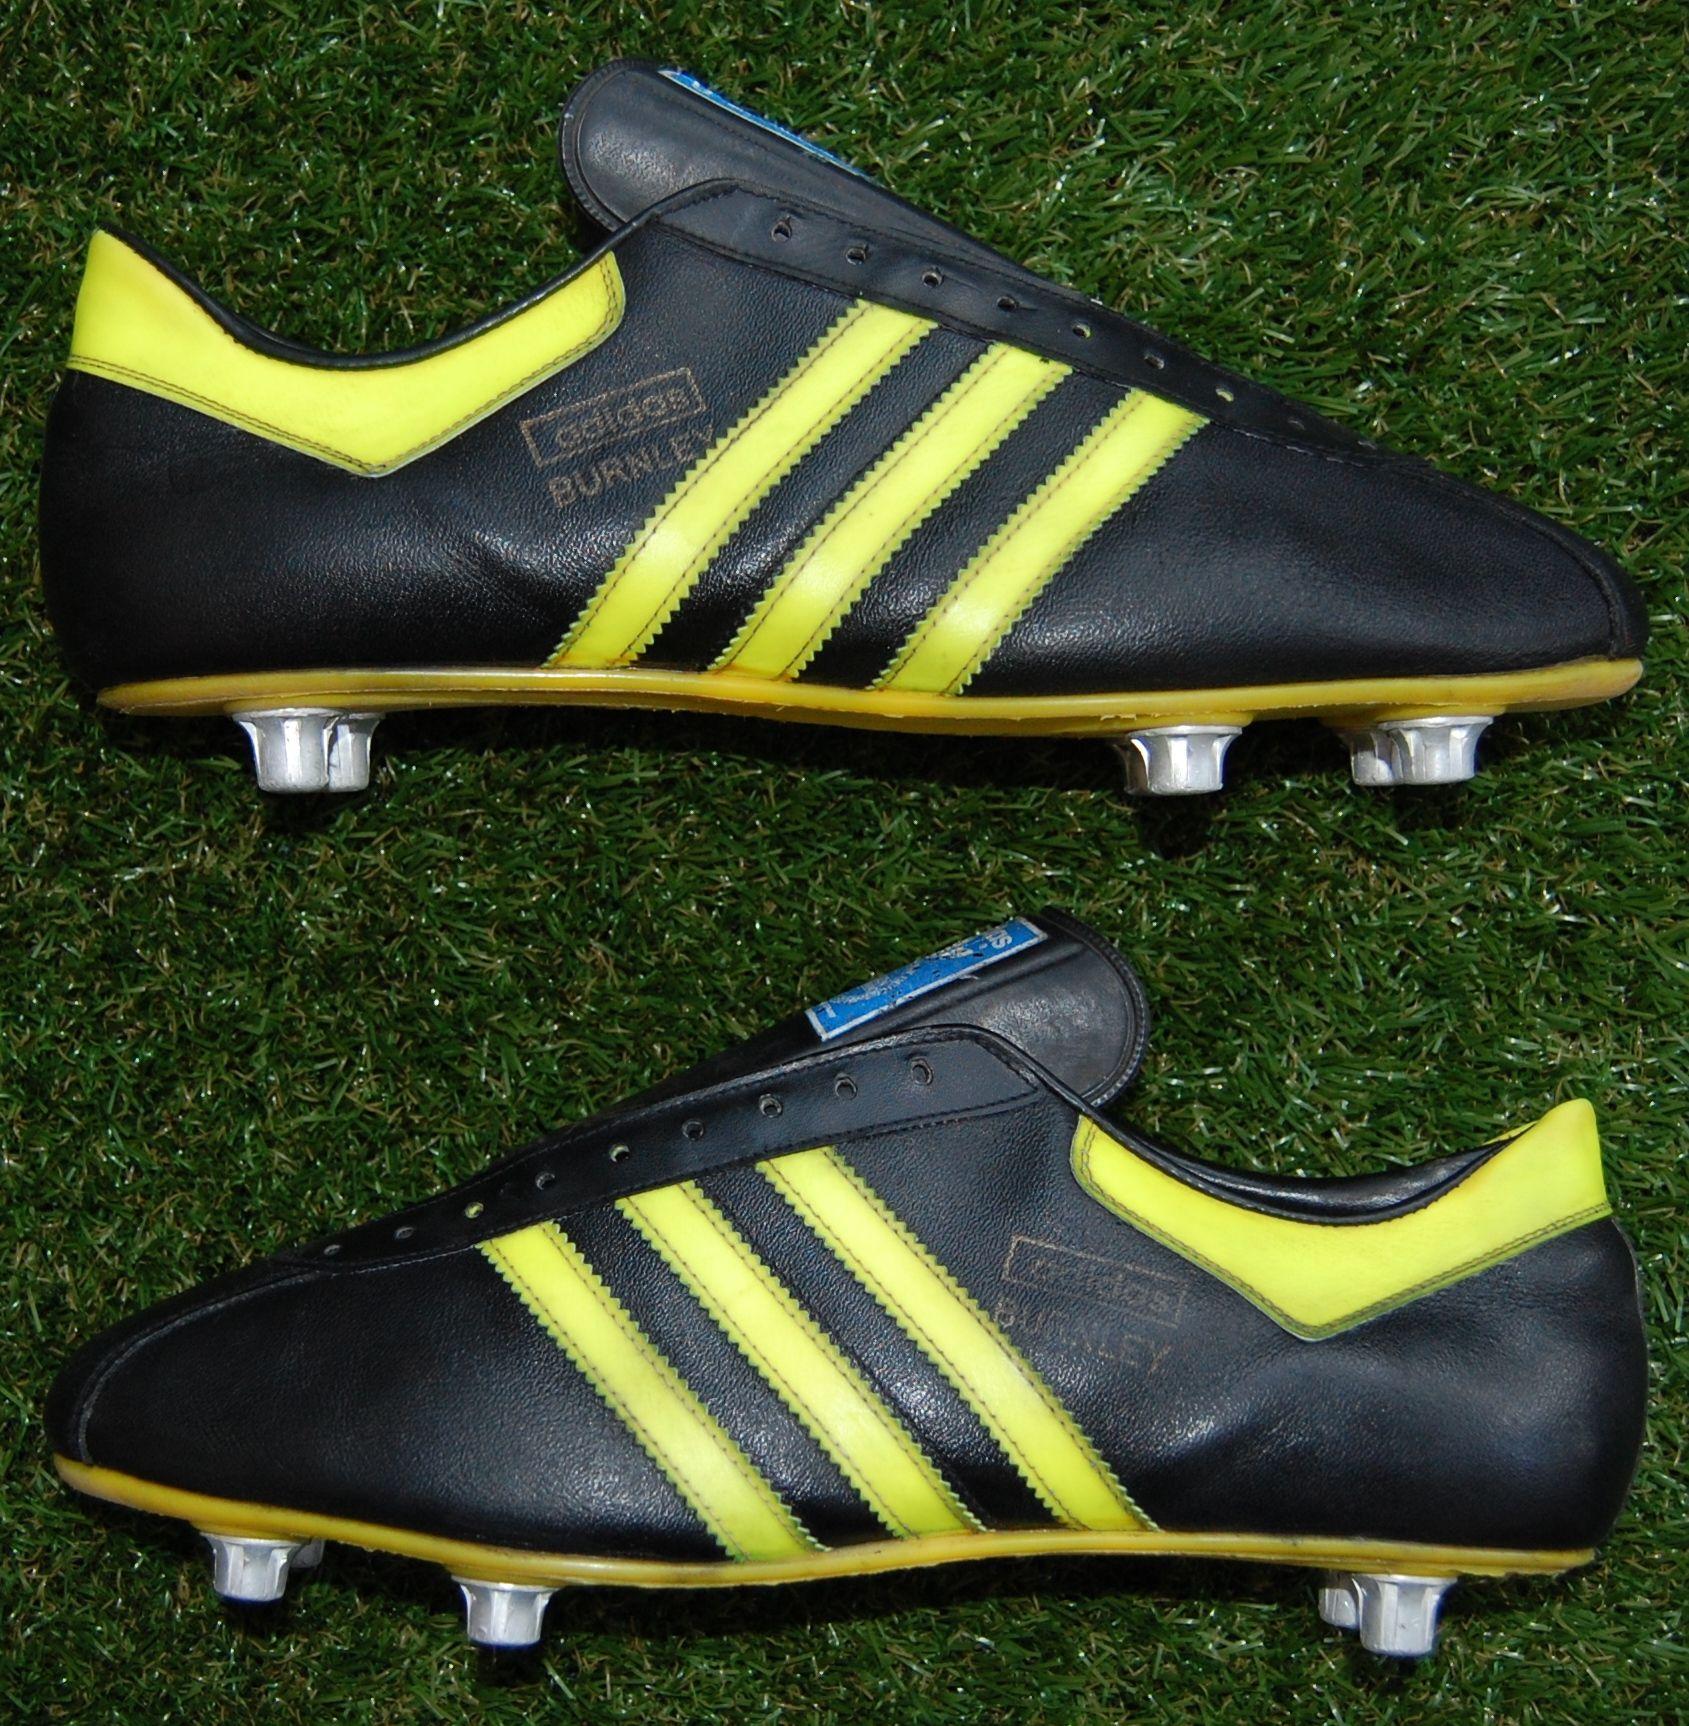 Adidas Burnley Boots.